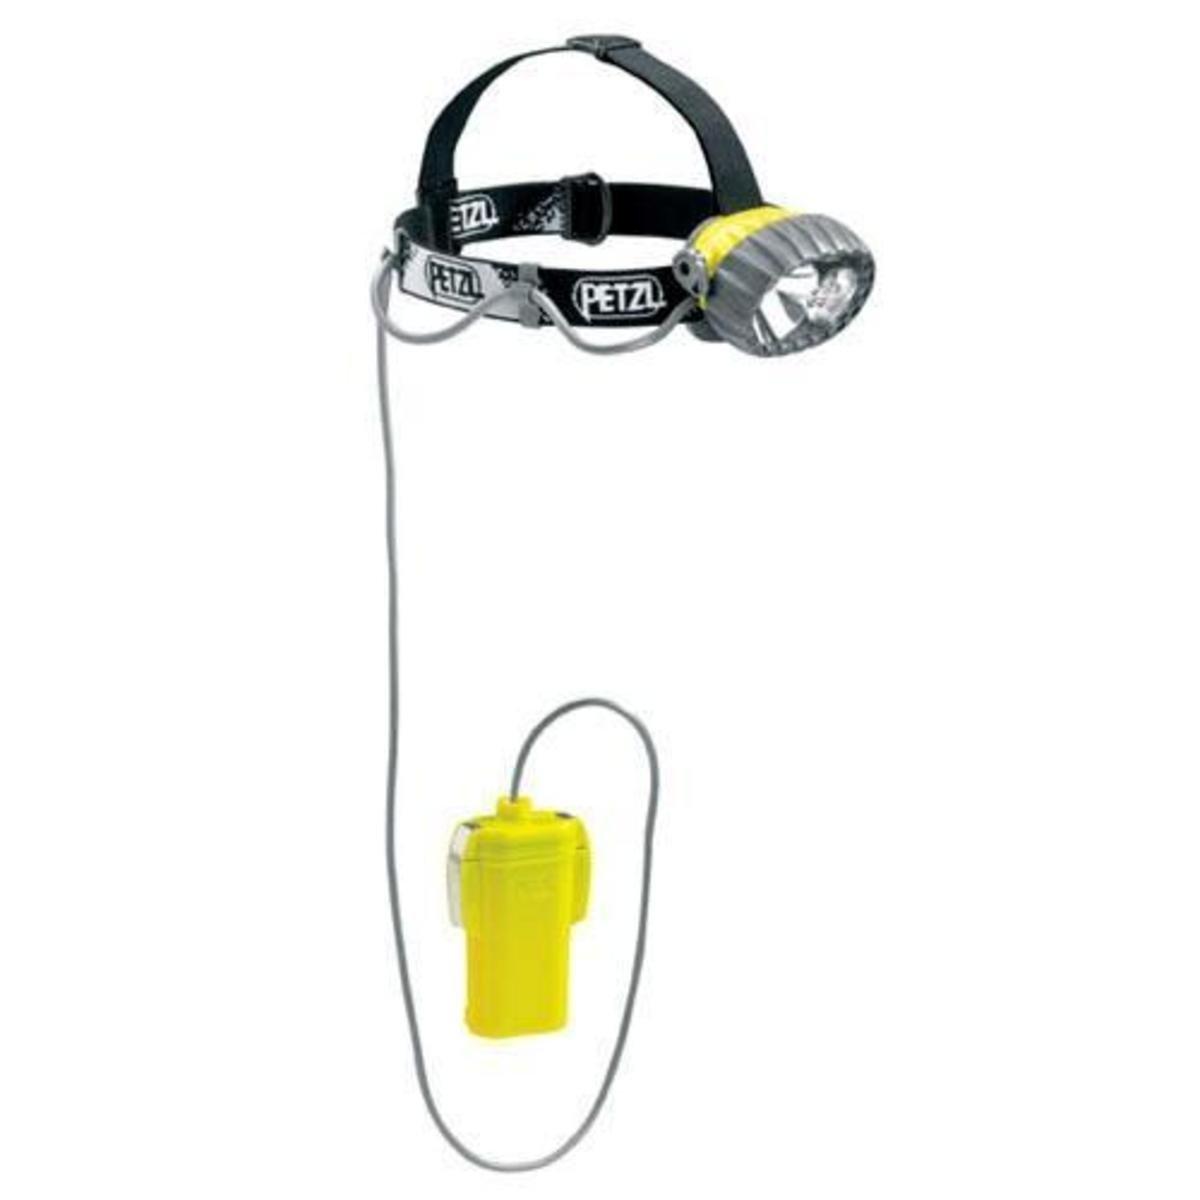 Petzl DUOBELT LED 5 headlamp by Petzl (Image #1)